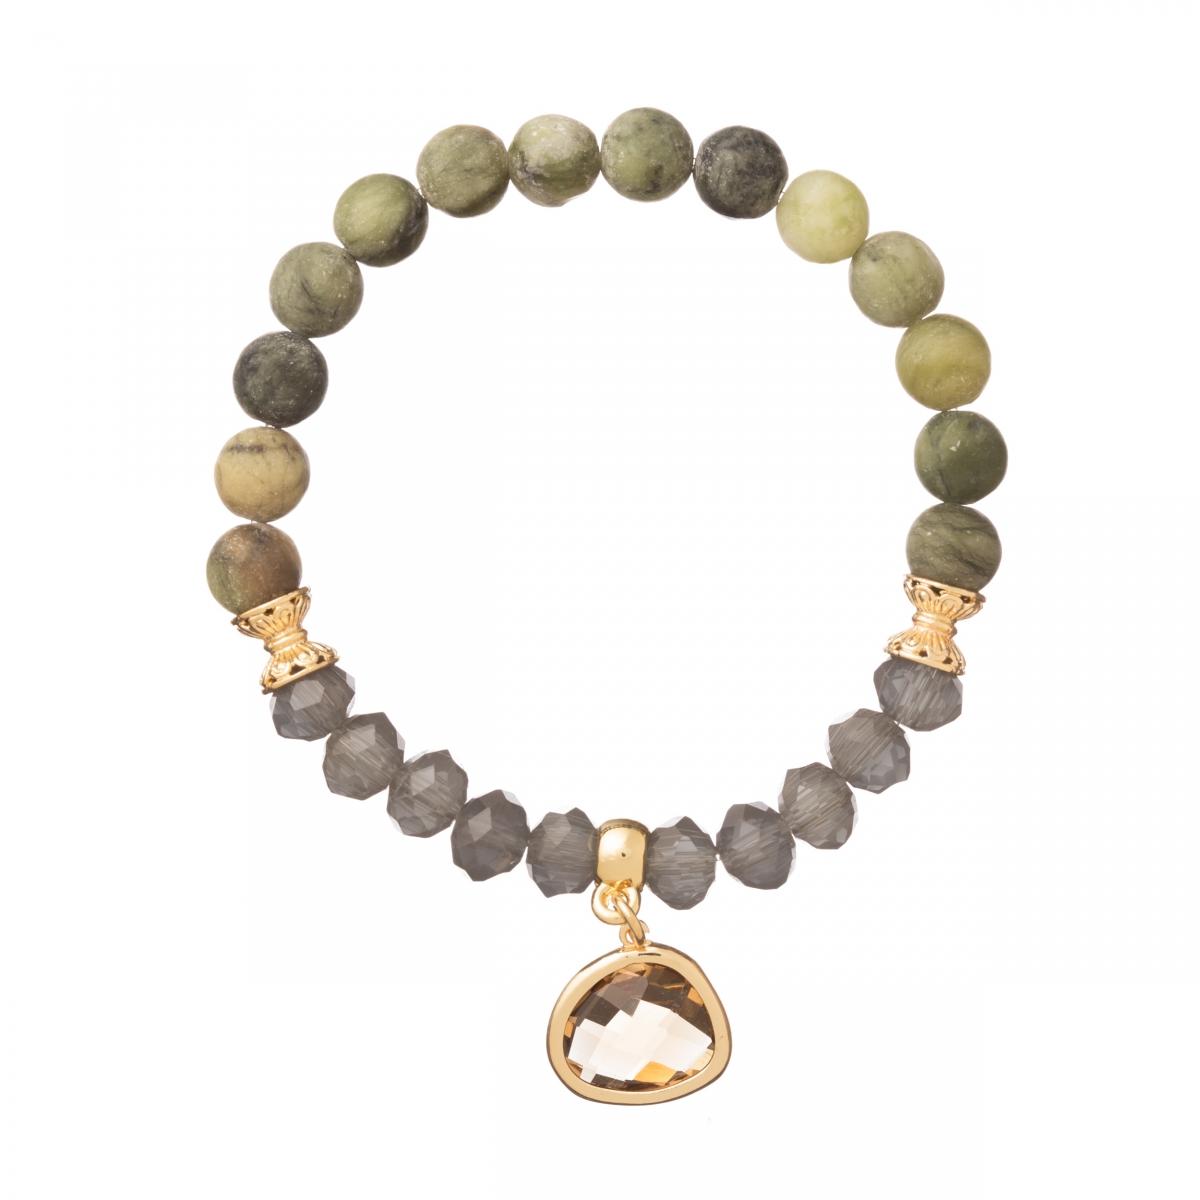 Náramok Mineral Green Gold Zircon Crystal